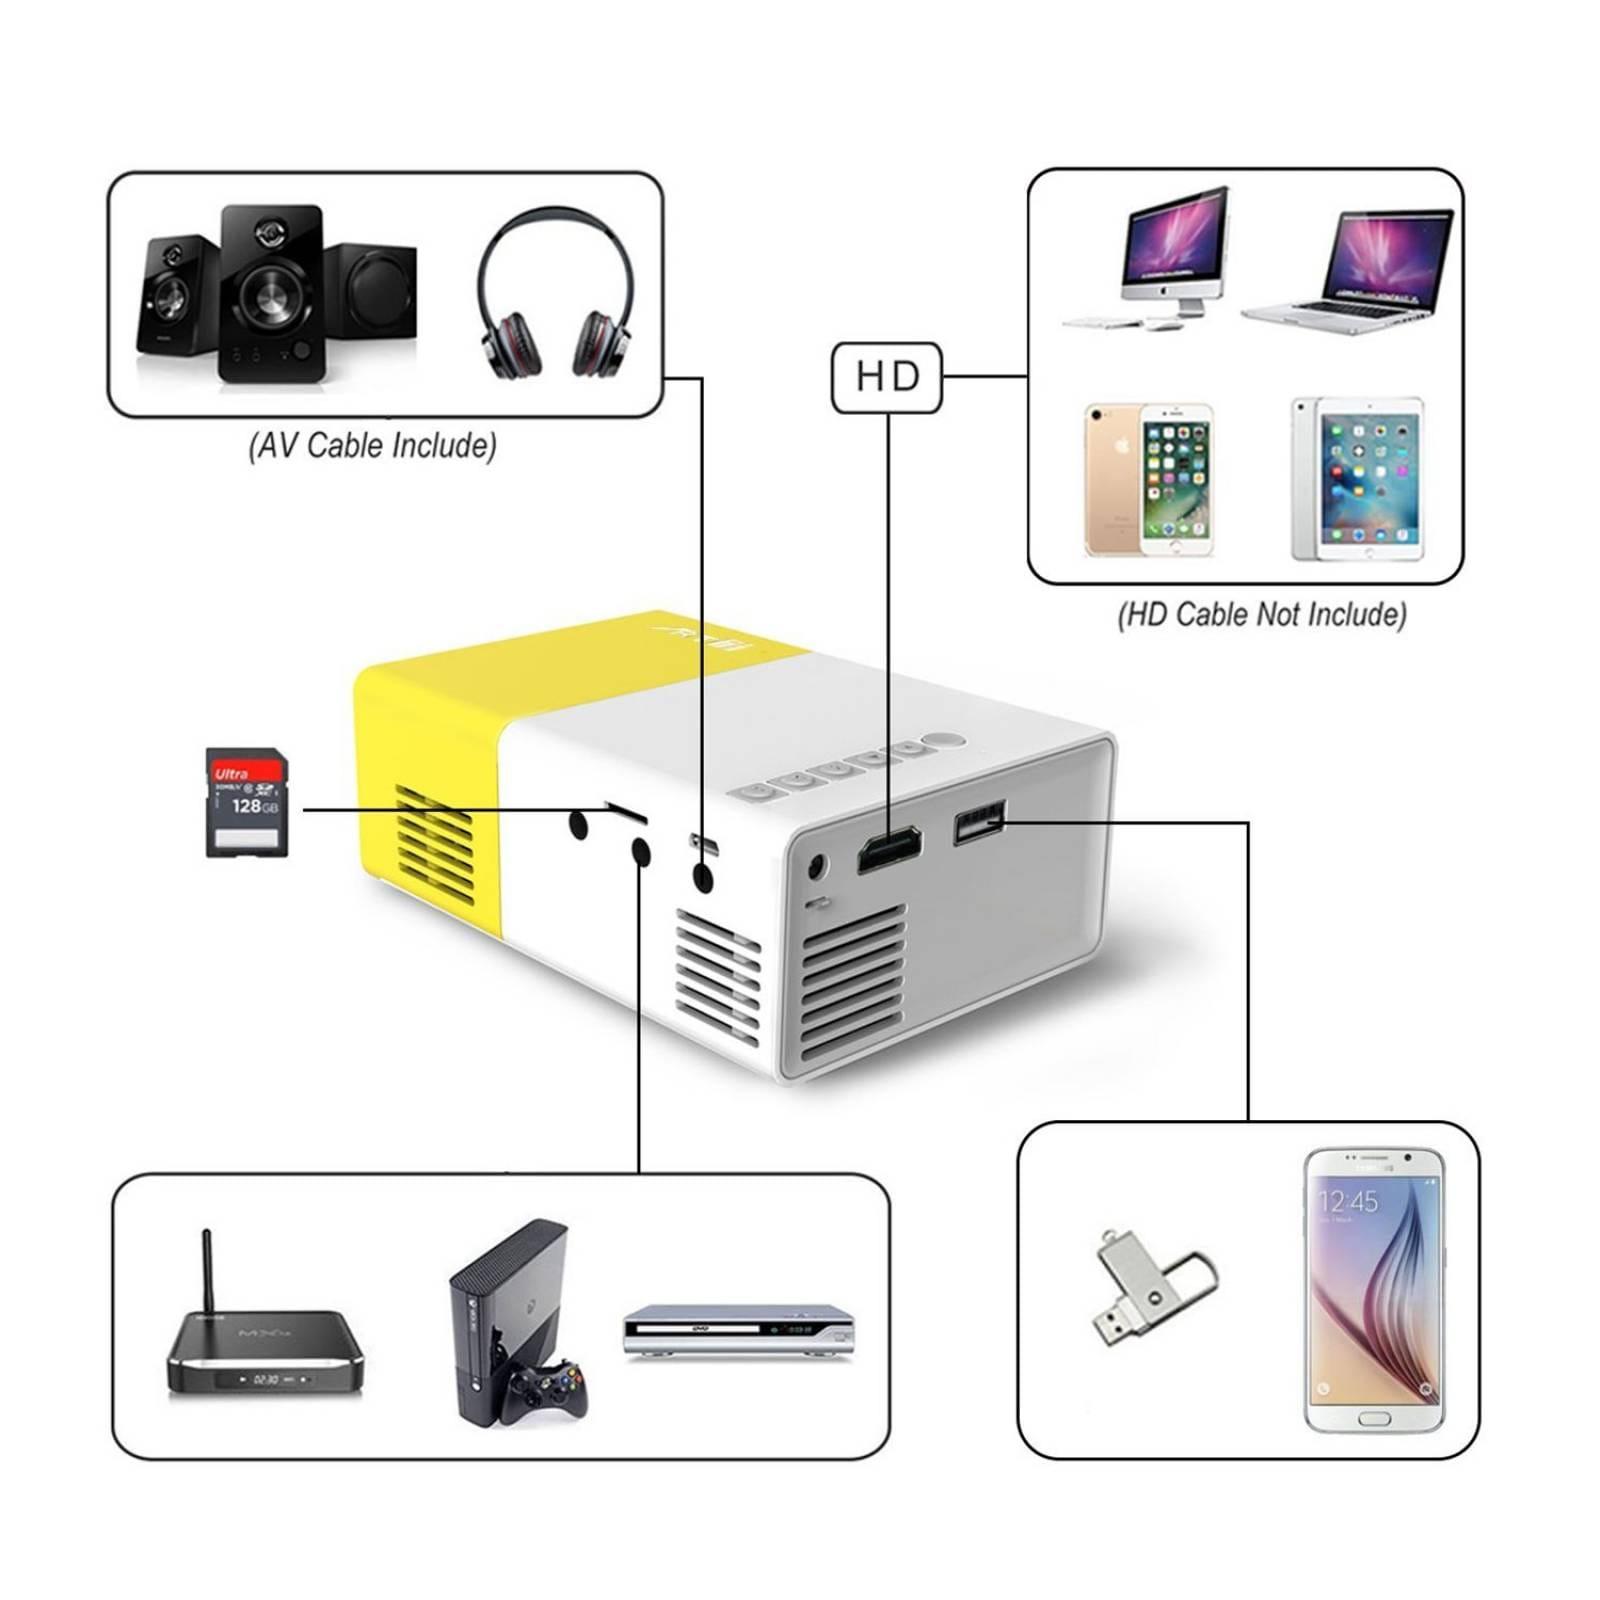 Mini proyector, Artlii portátil LED proyector fundaro cine C